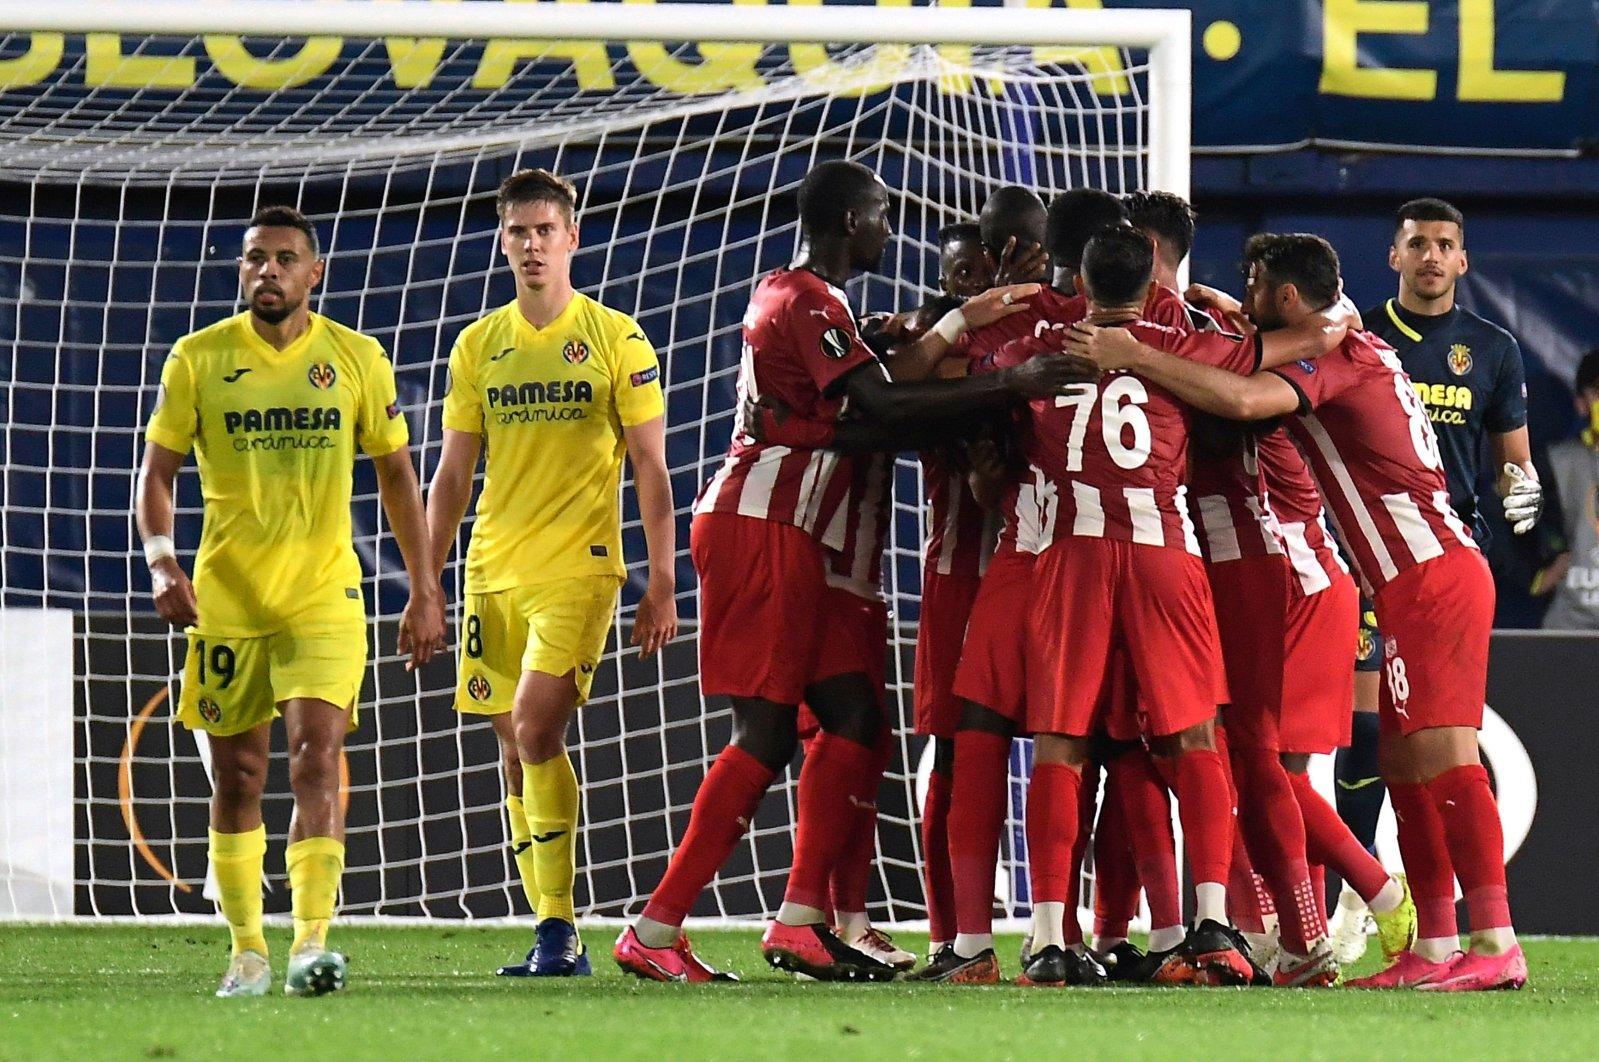 Sivasspor's players celebrate after scoring a goal against Villarreal, in Villarreal, Spain, Oct. 22, 2020. (AFP Photo)